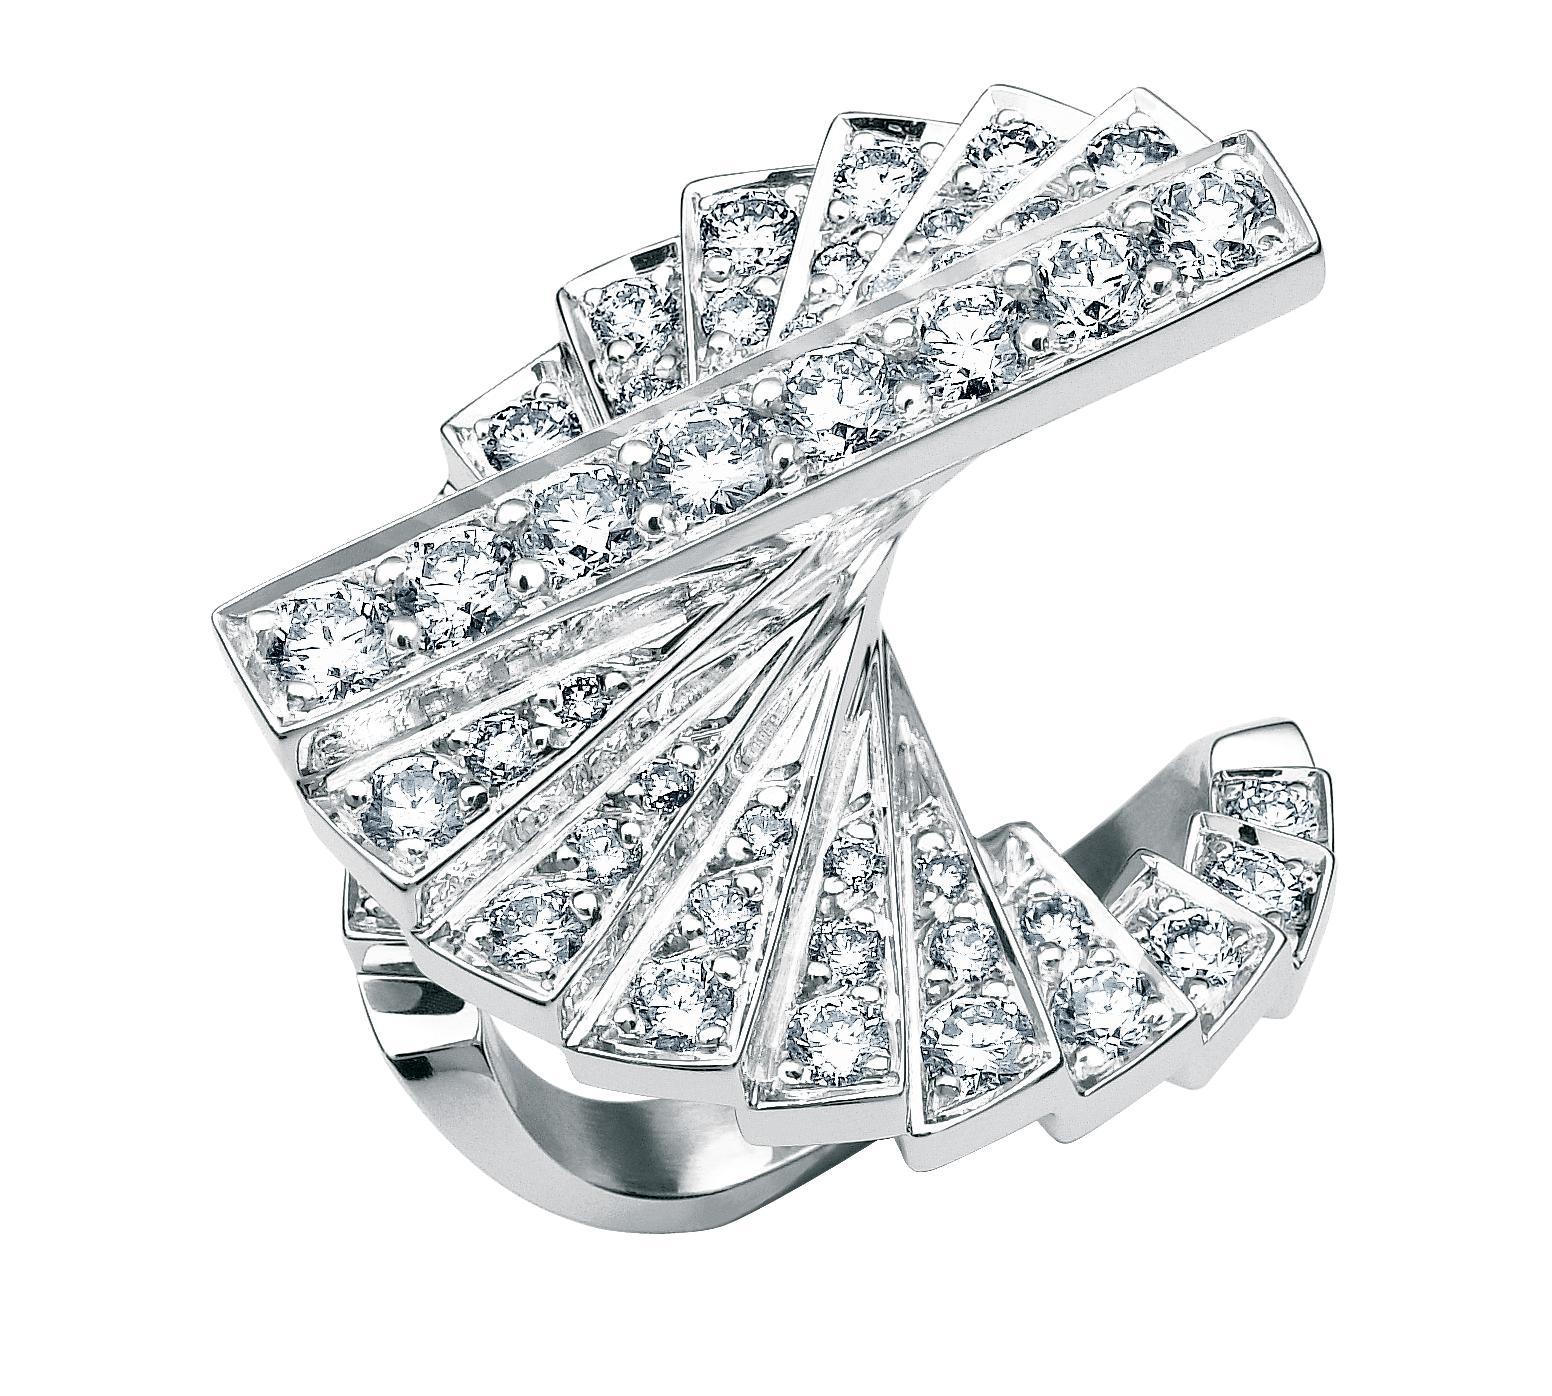 ROURE-COLLECTION ESCALIER-BAGUE DIAMOND INTERNATIONAL AWARD-DIAMANT:OR BLANC